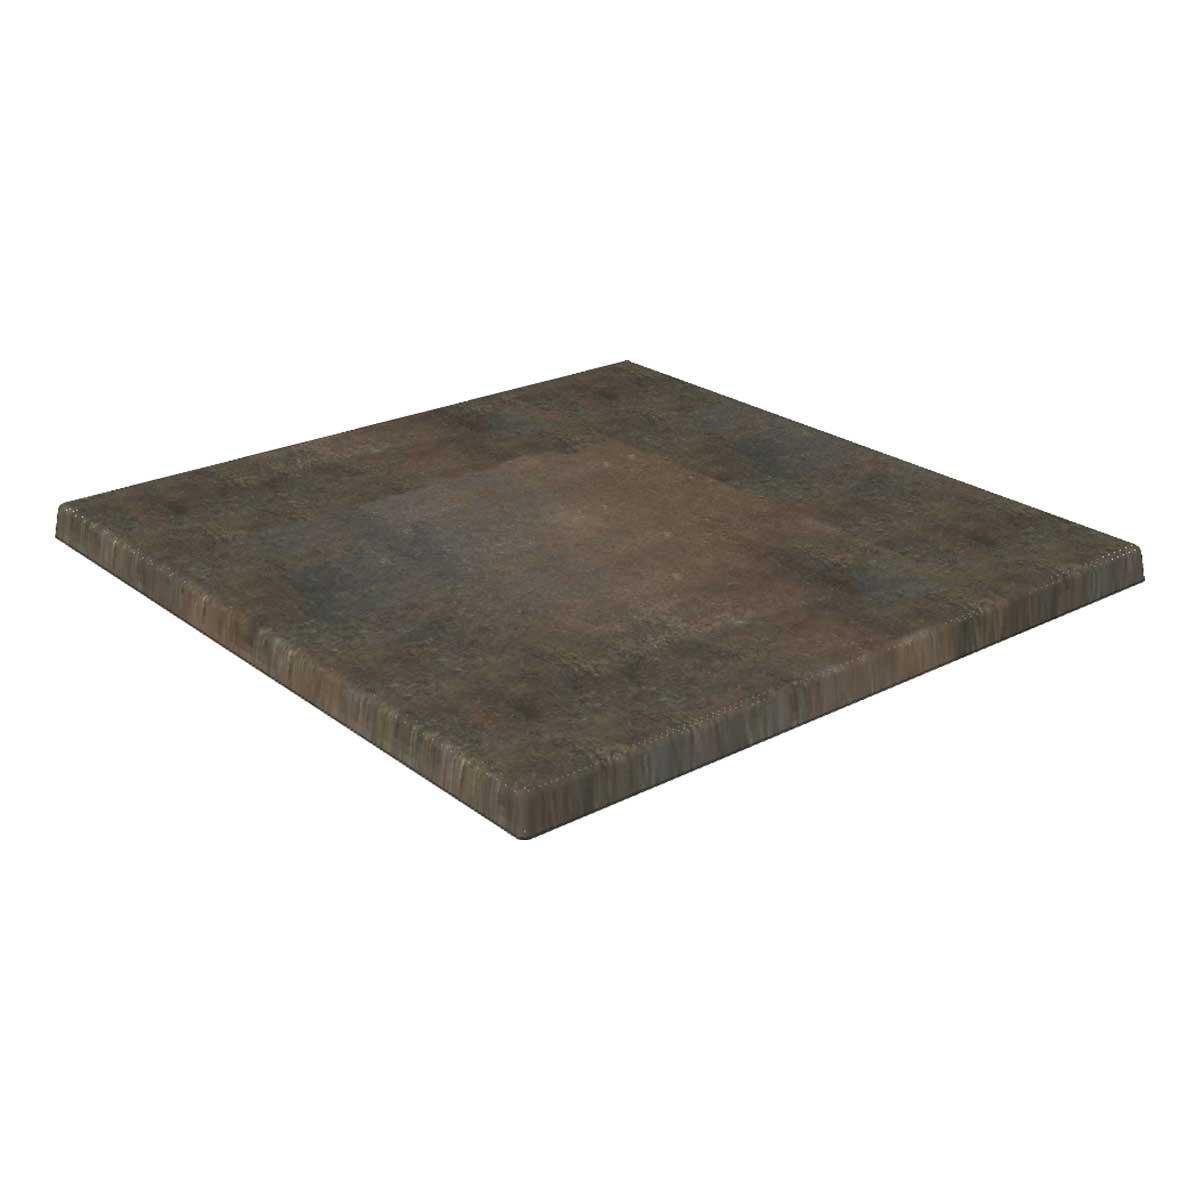 TICLA Q70 083 - https://www.werzalit.com/nl/product/tafelblad-classic-werzalit-q-70x70-083-factory/